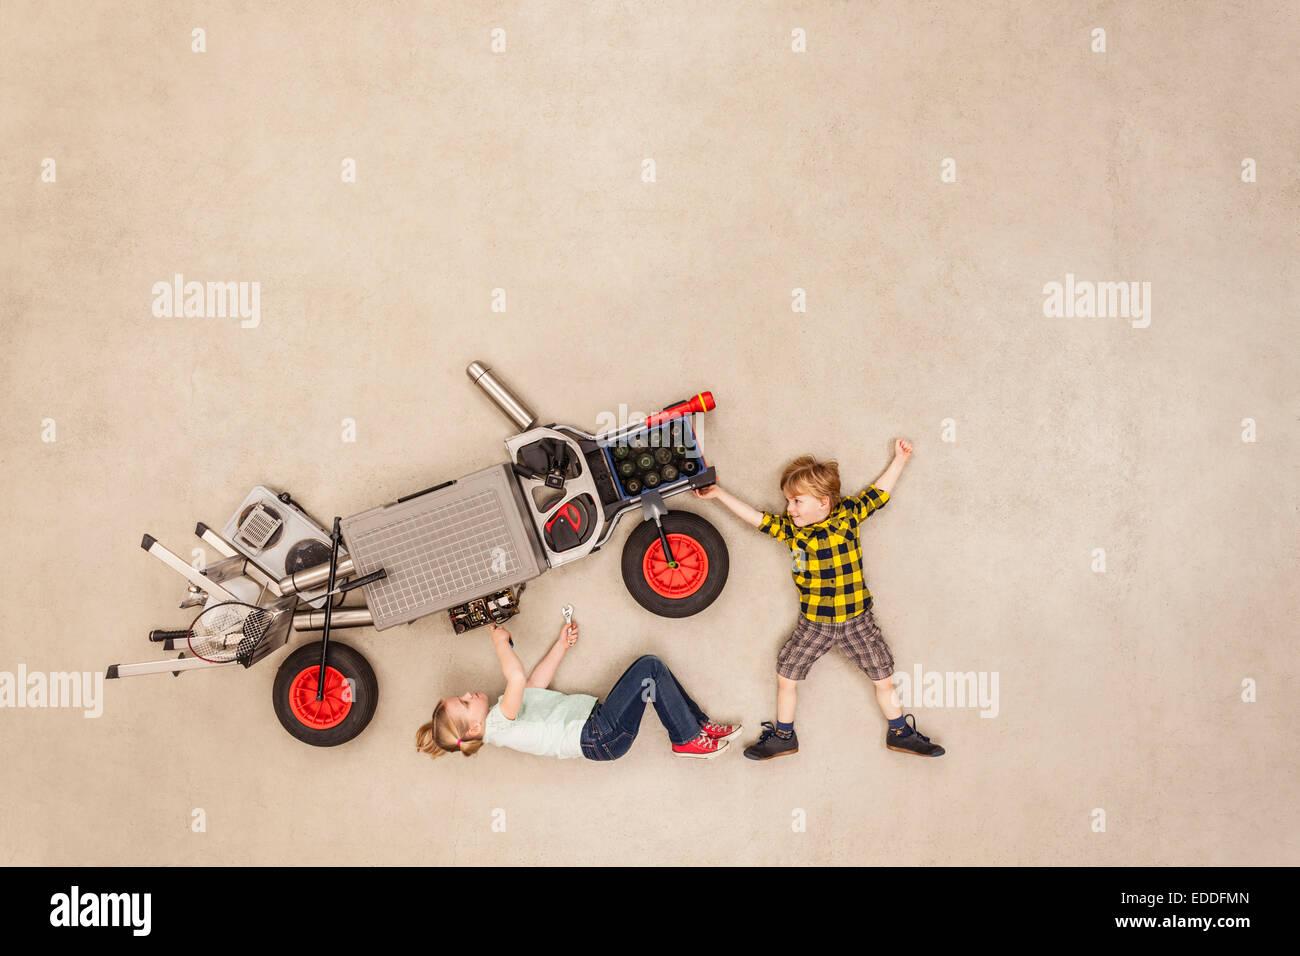 Kids assembling motor vehicle - Stock Image